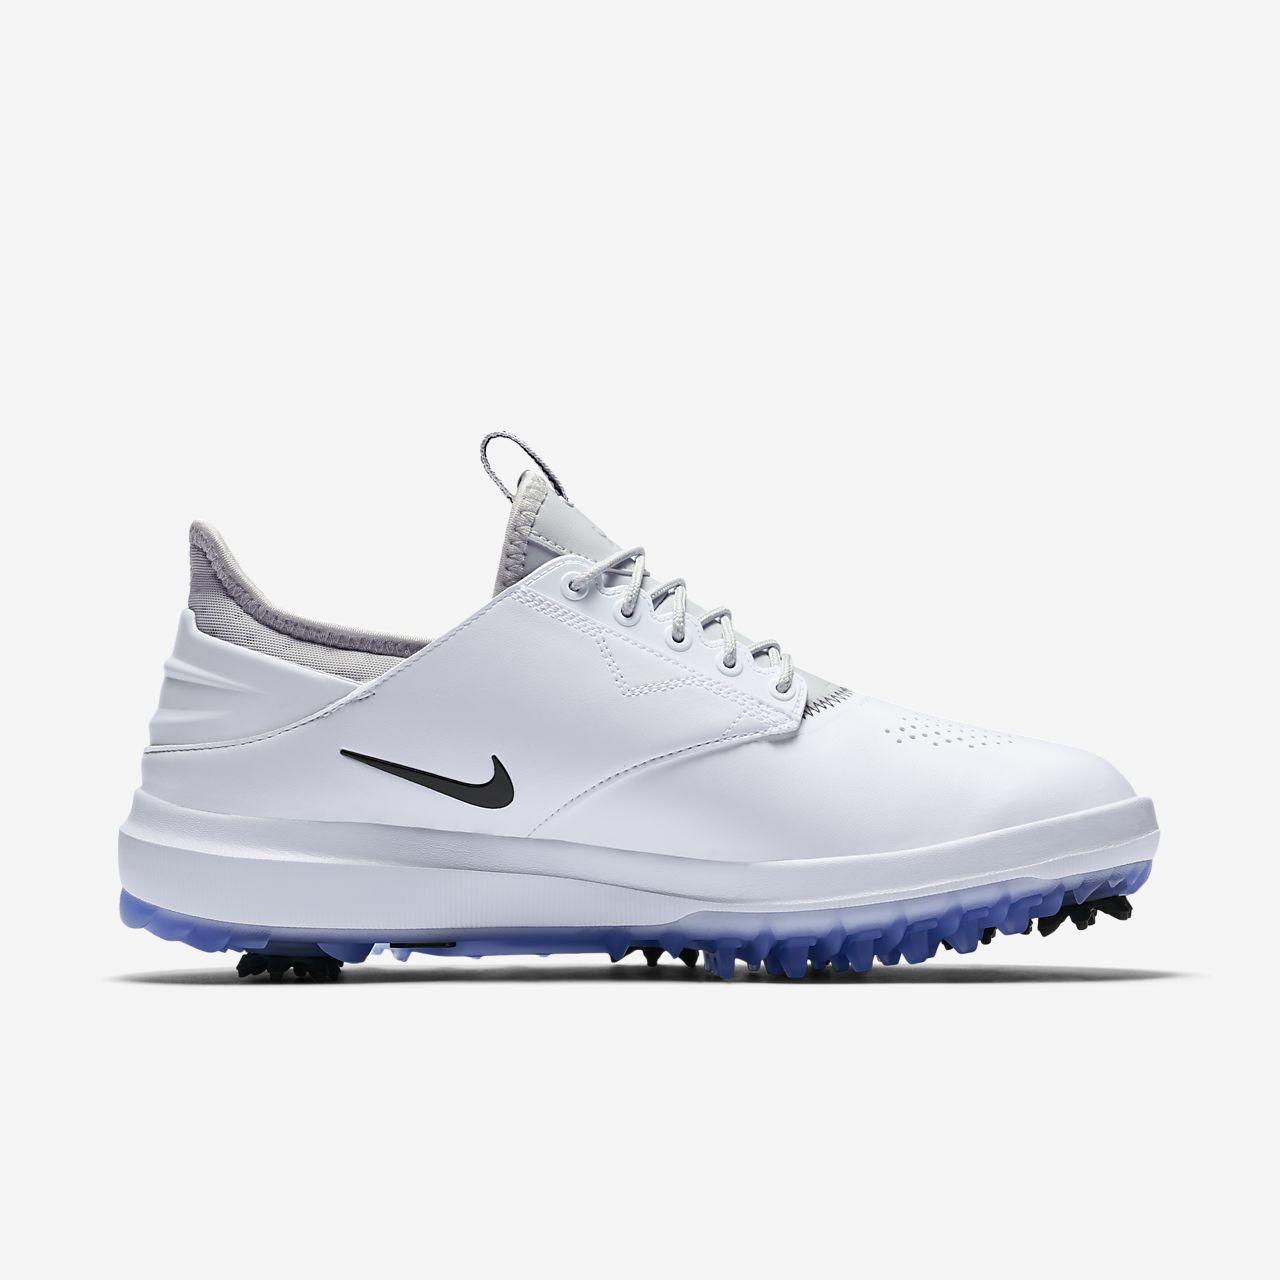 new style 49e51 a1837 Nike Air Zoom Direct Men's Golf Shoe. Nike.com CA